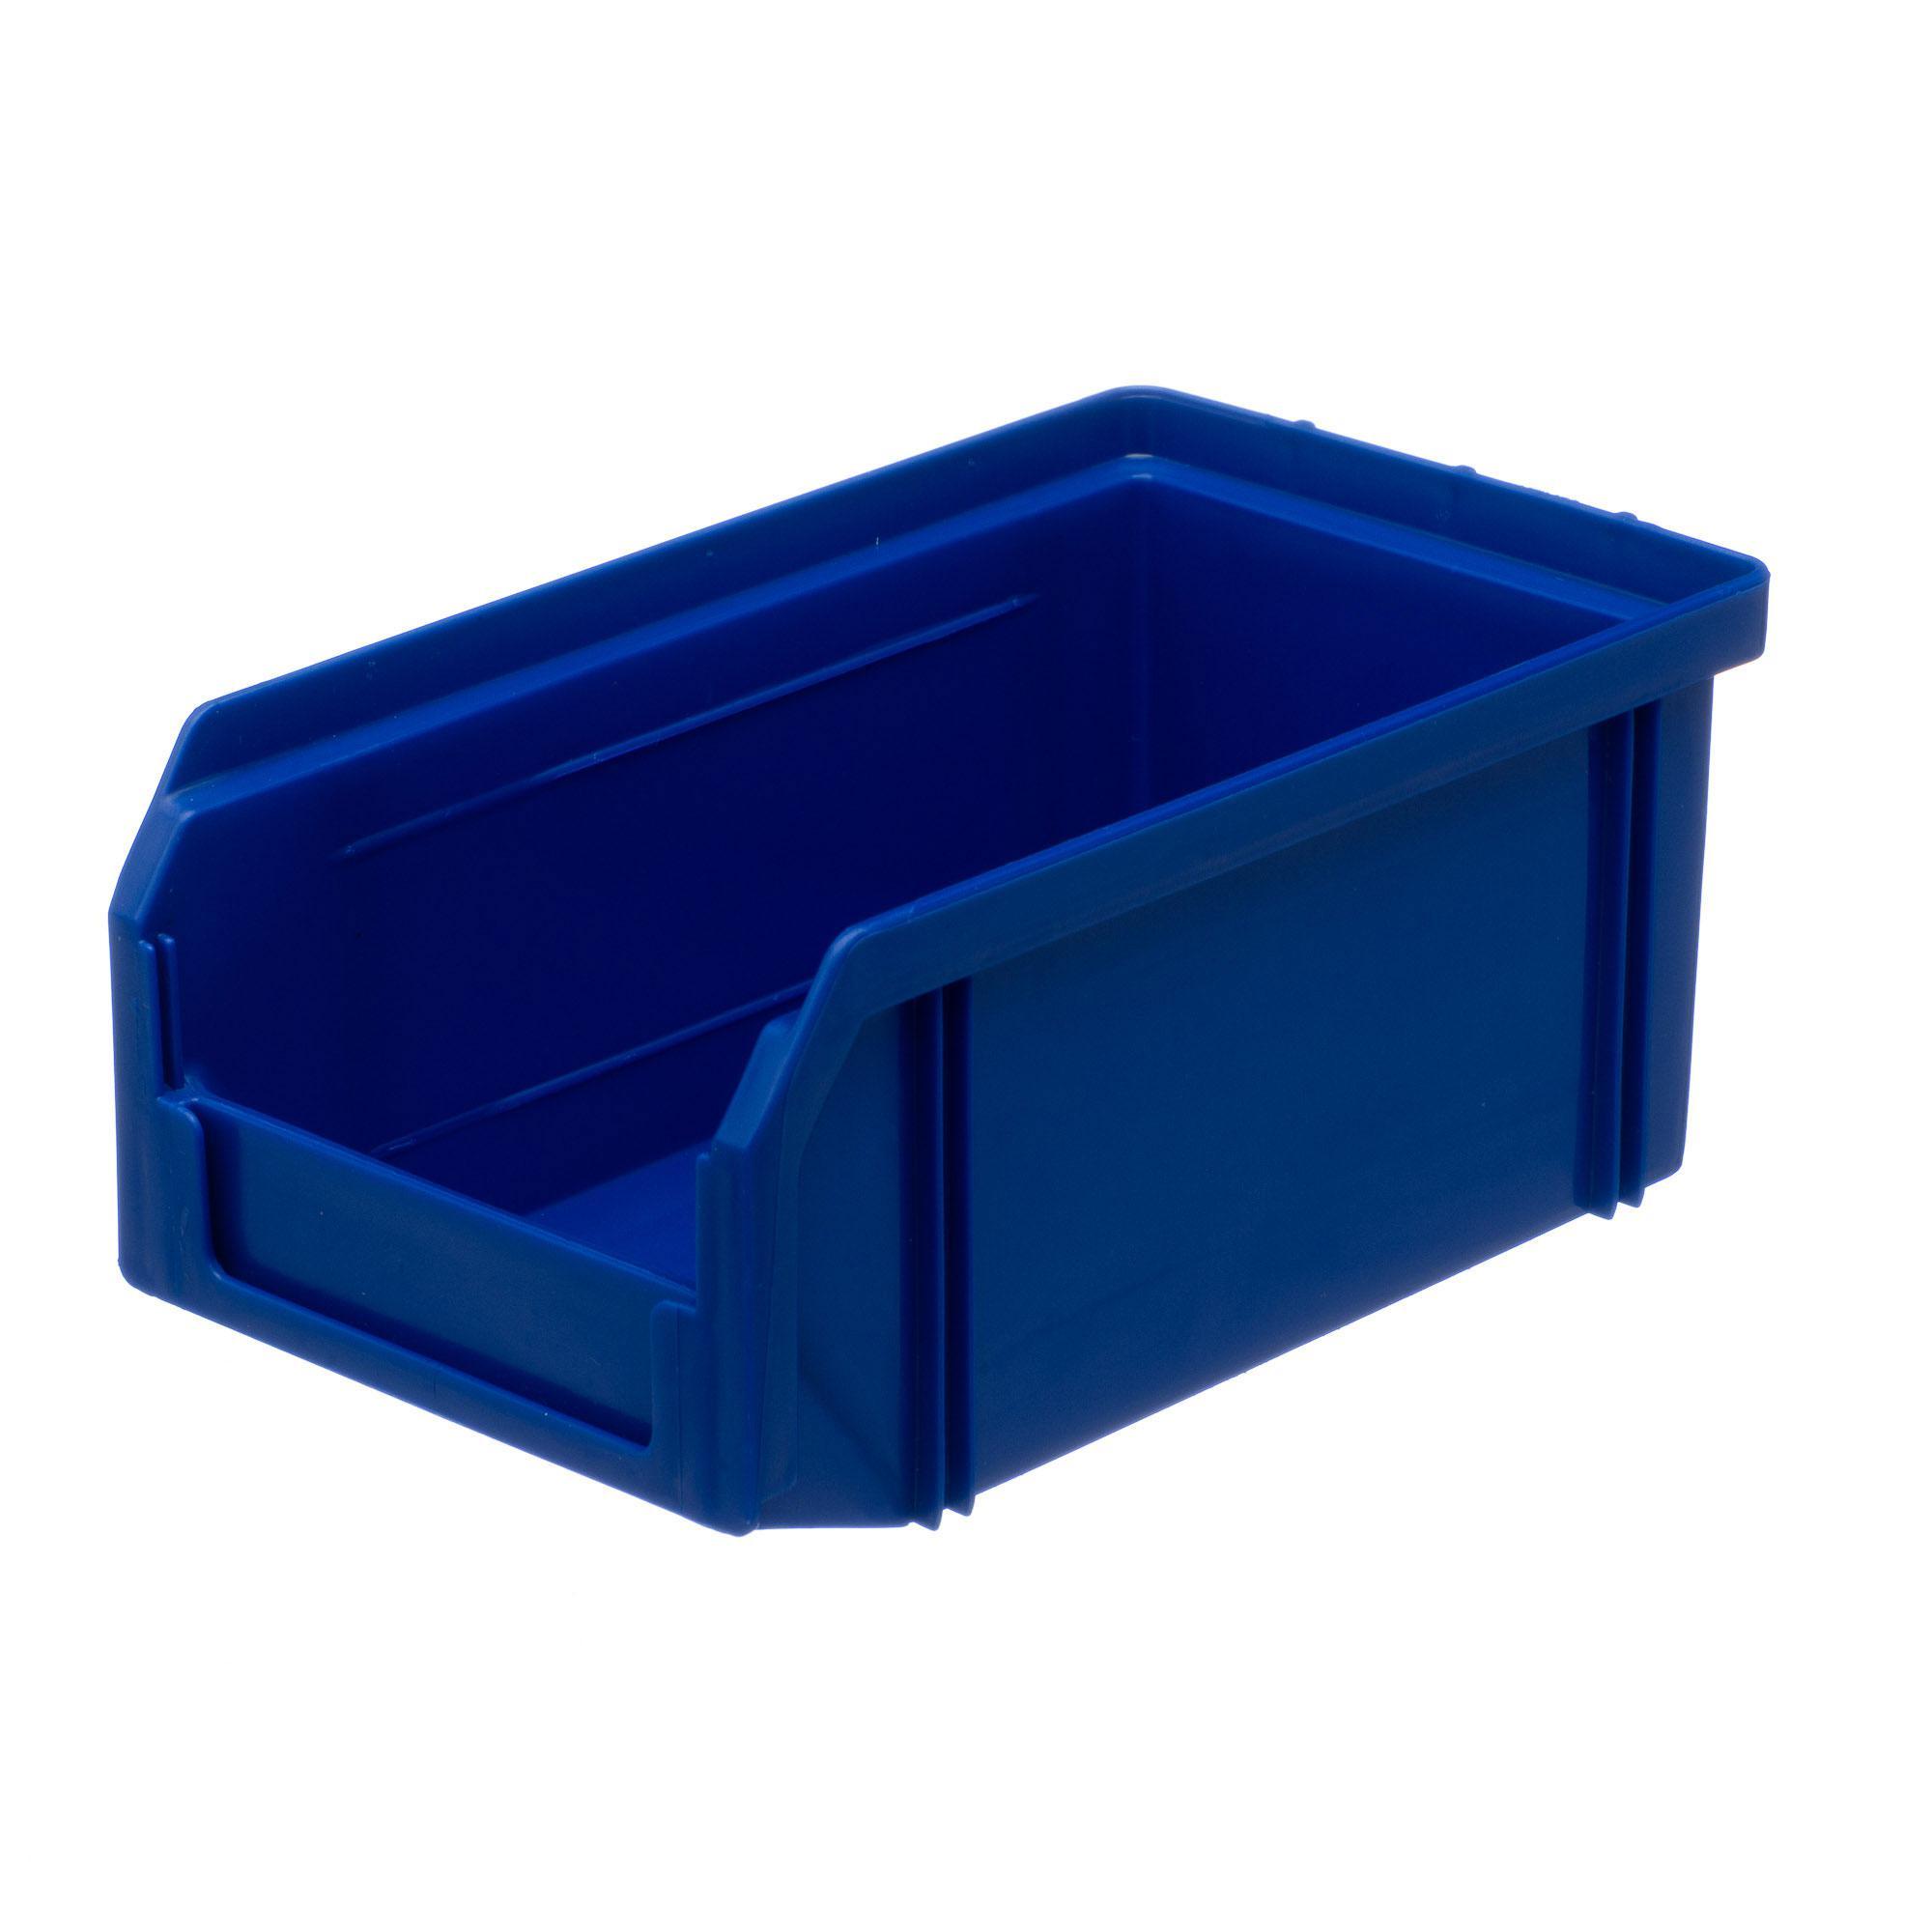 Ящик СТЕЛЛА V-1 синий от 220 Вольт